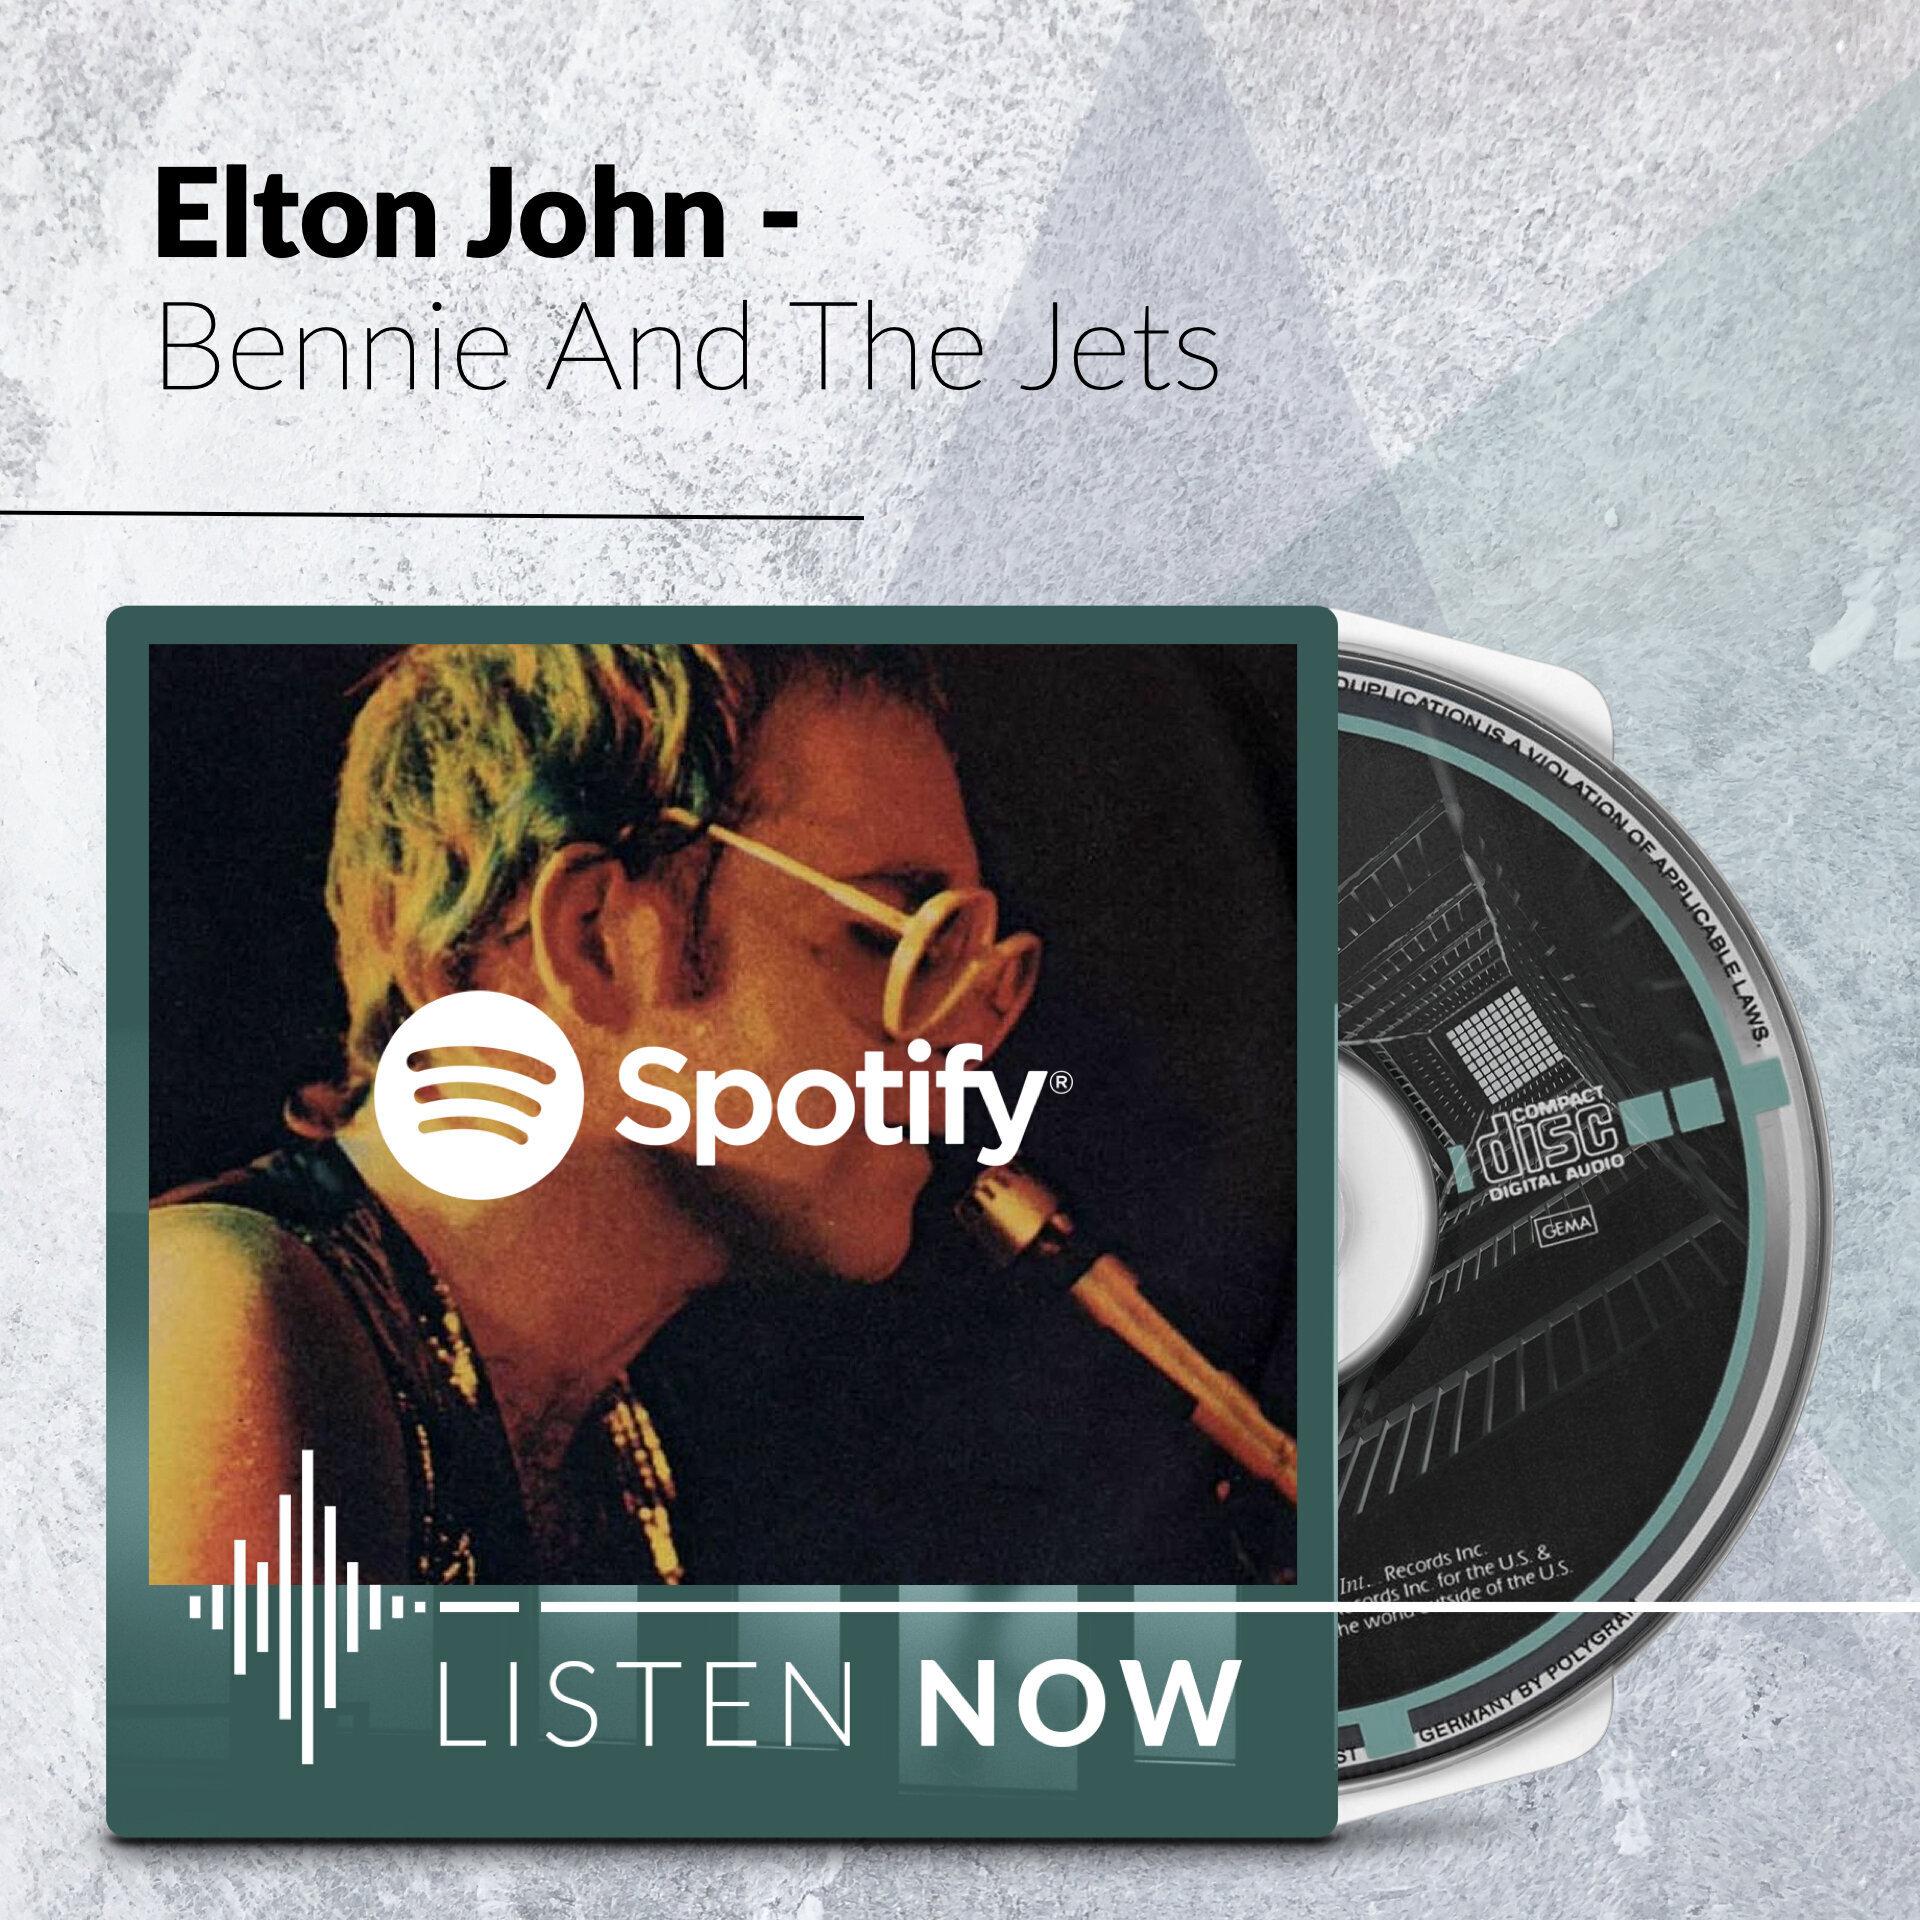 EVOKE Spotify